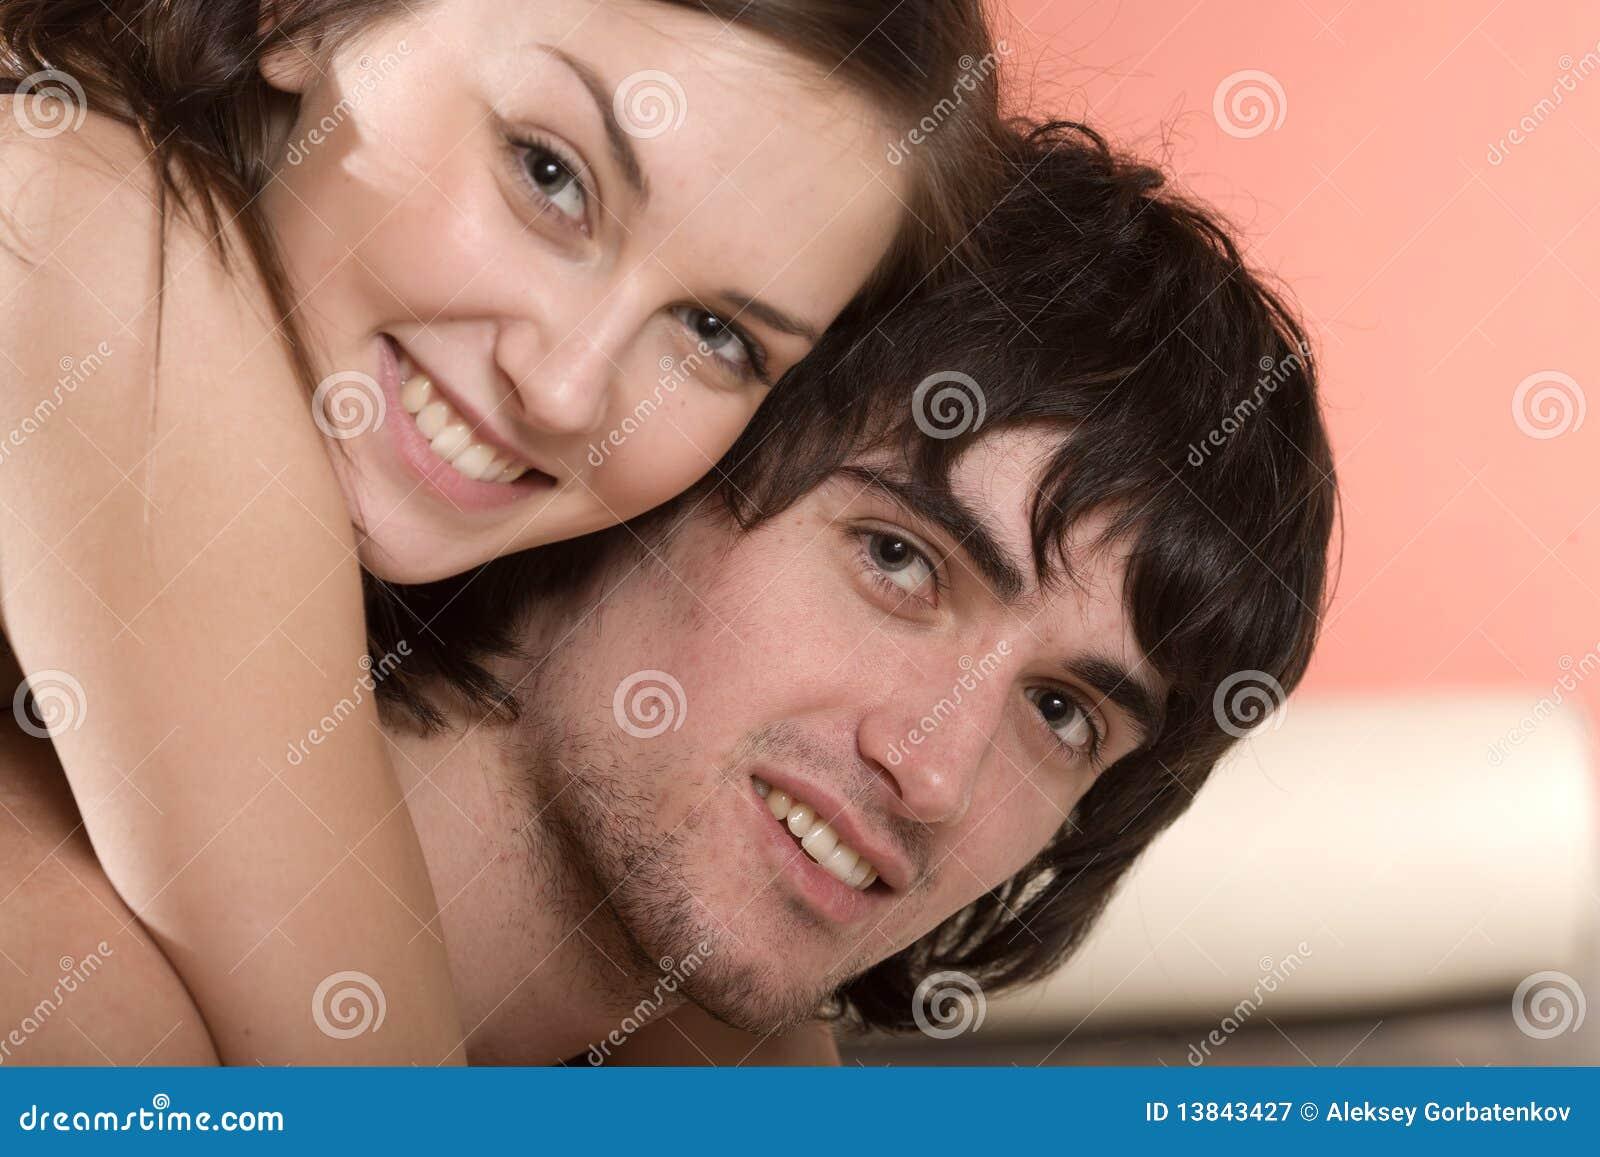 rebbeca cardon naked having sex